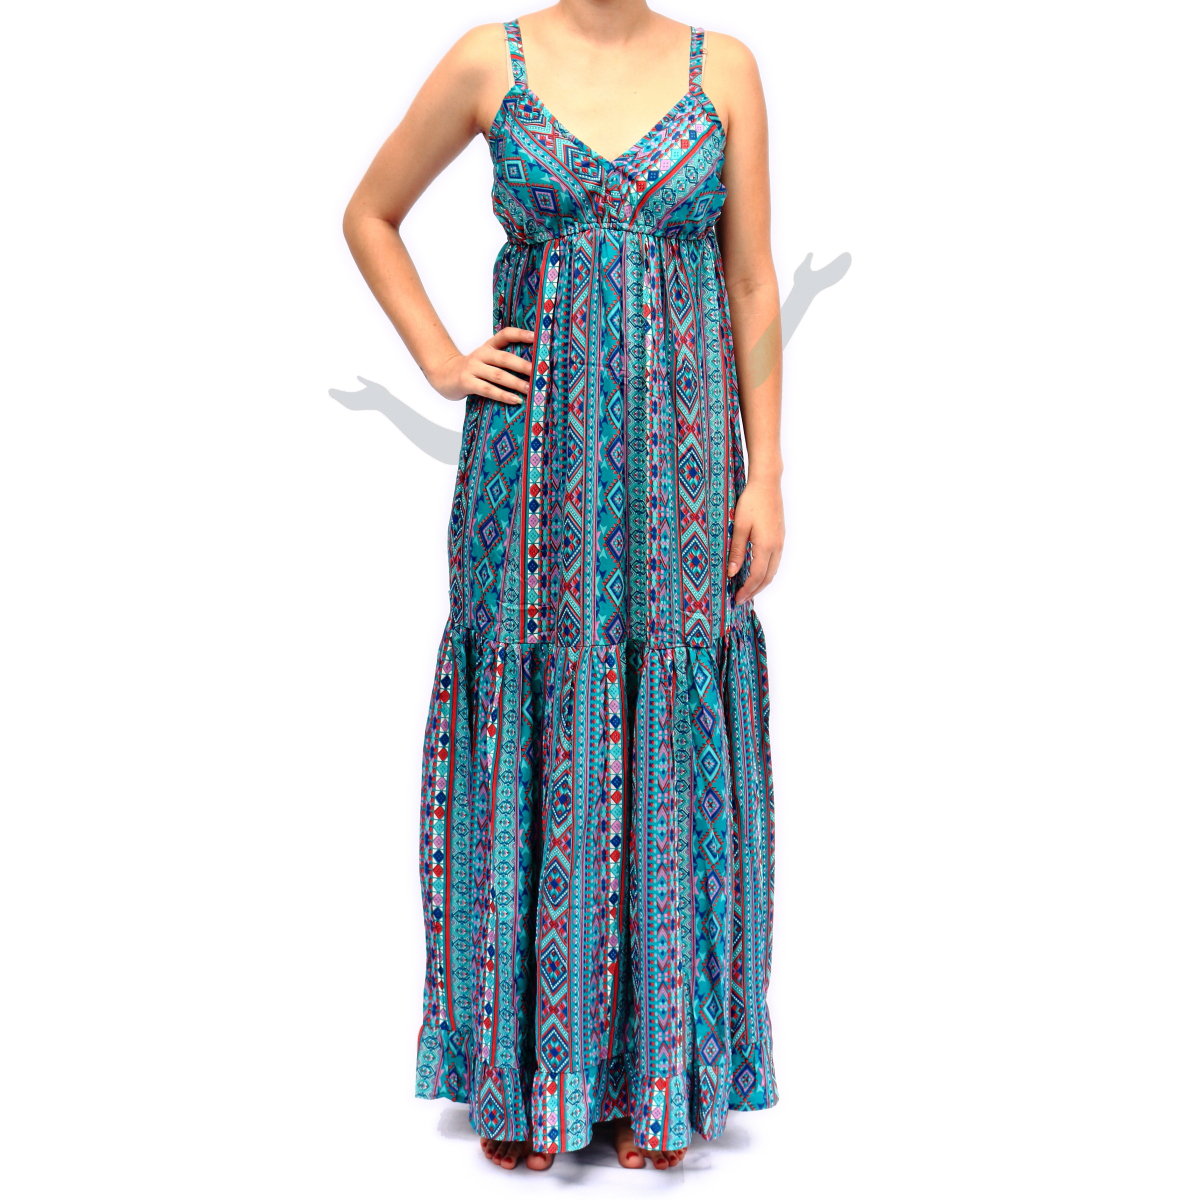 Sankirtana-Shop-Vestido-Azul.JPG